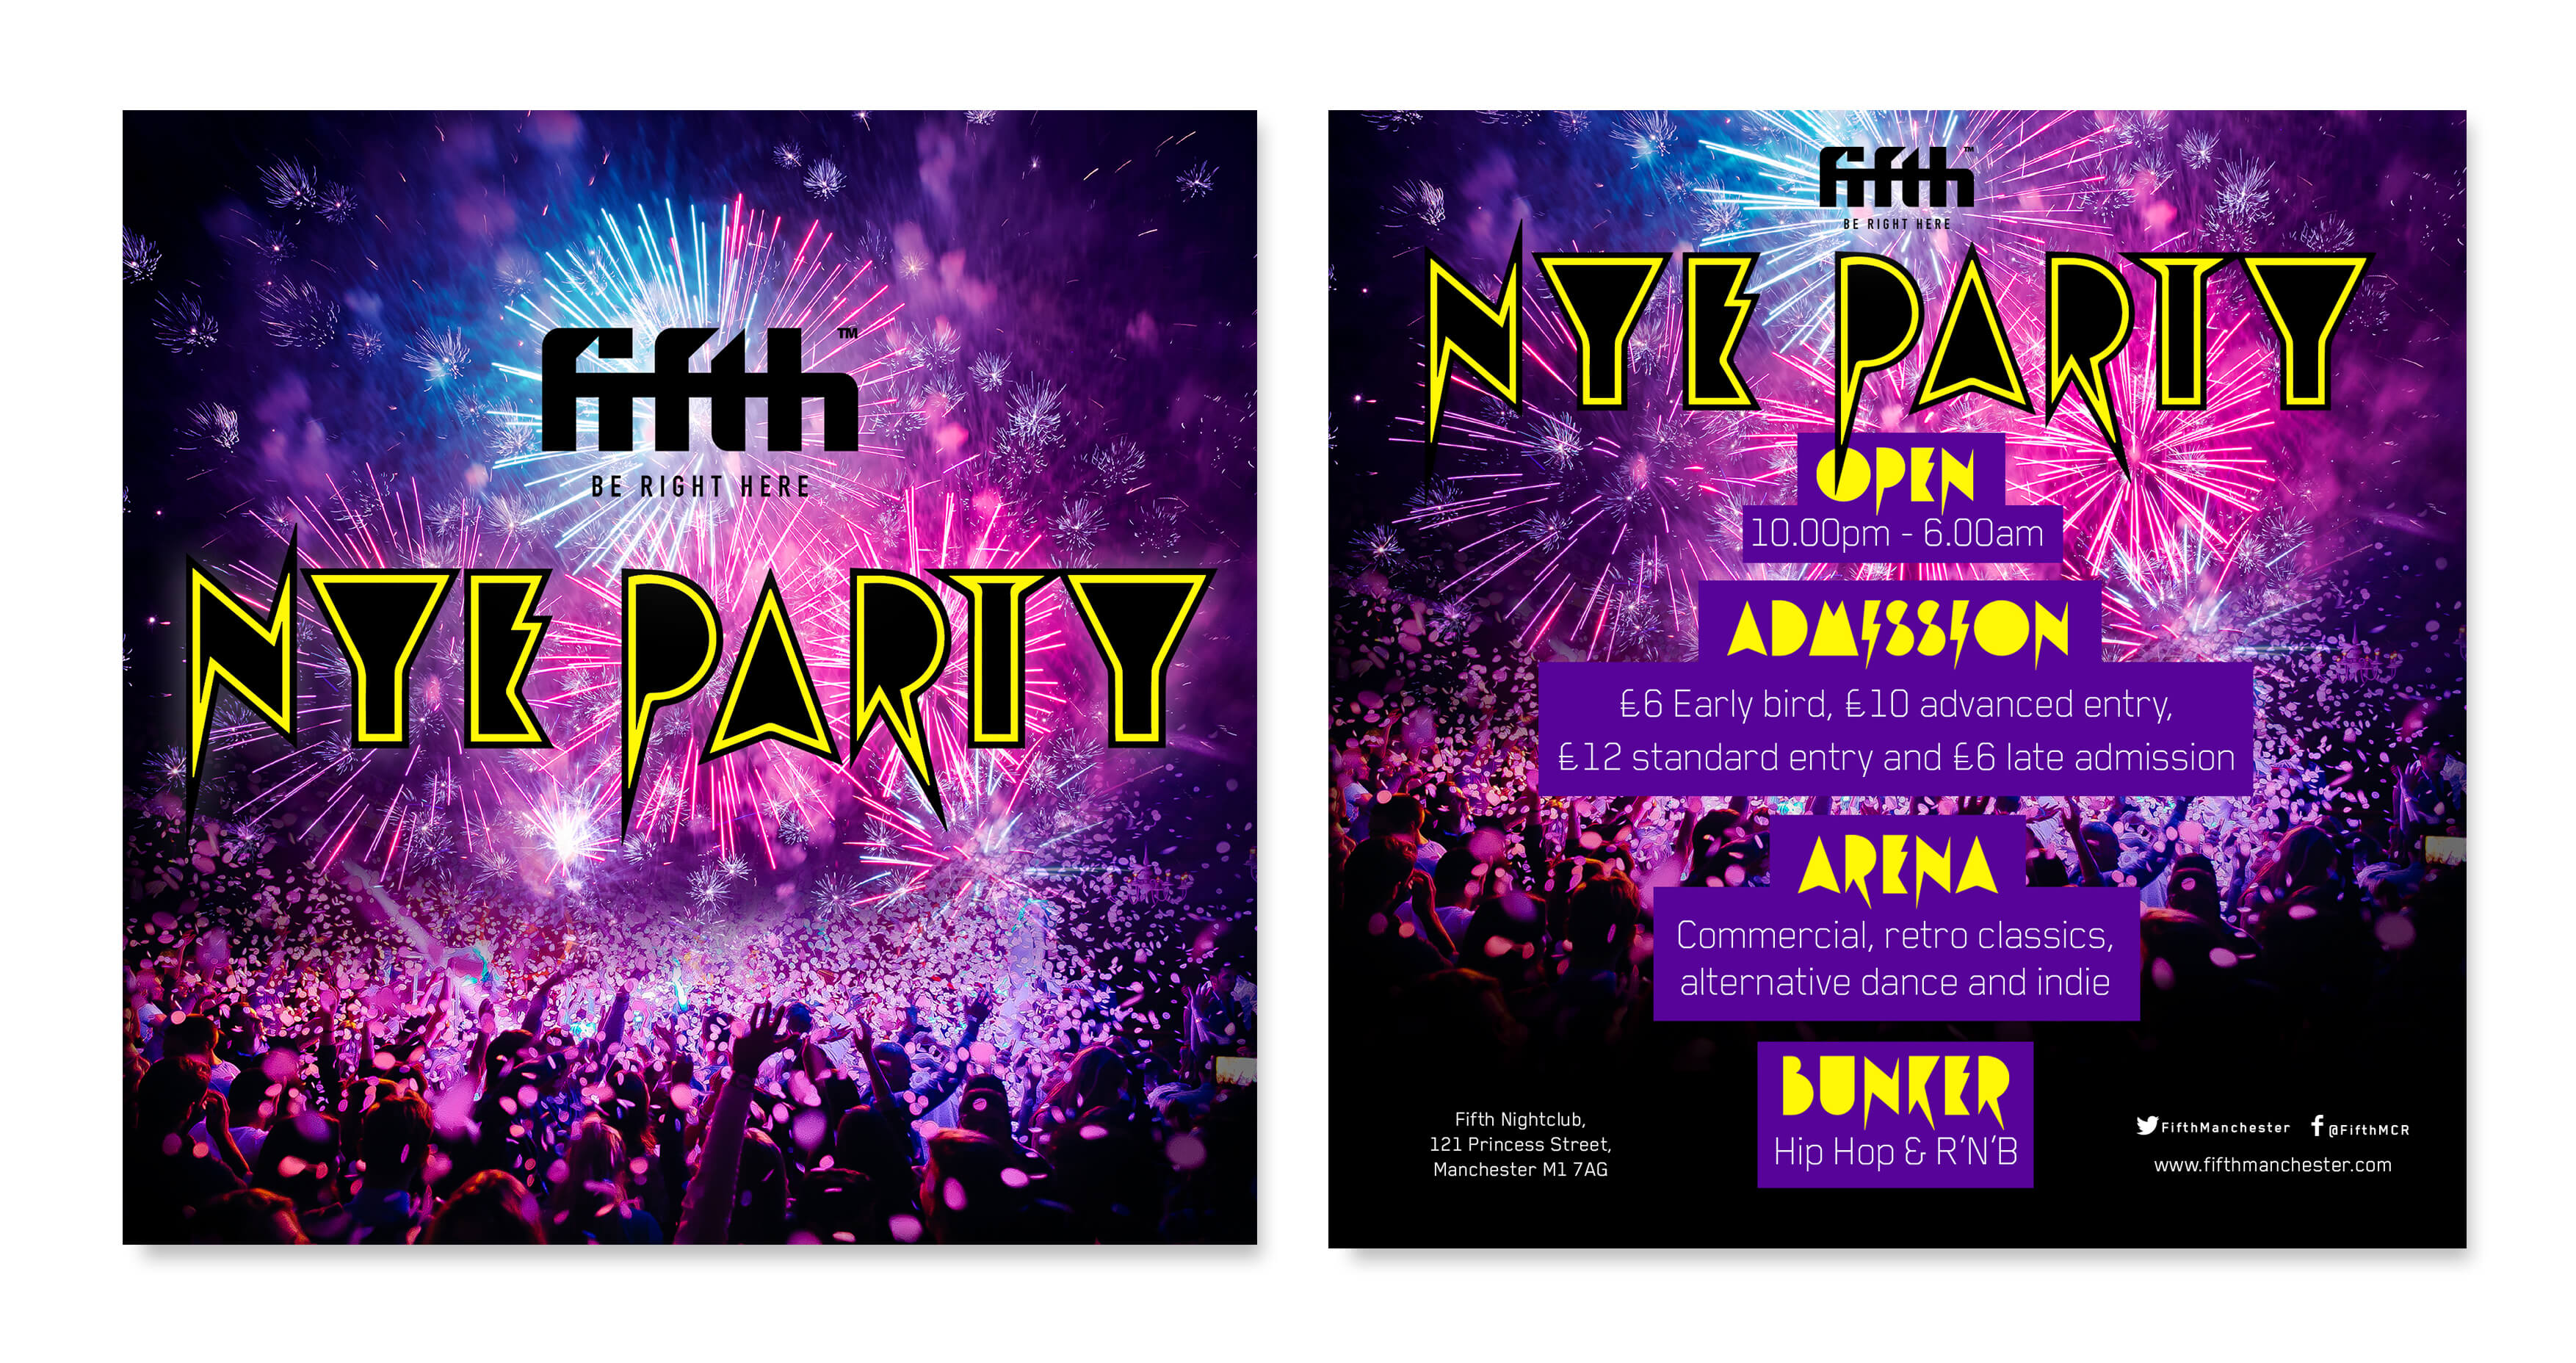 NYE party 2017